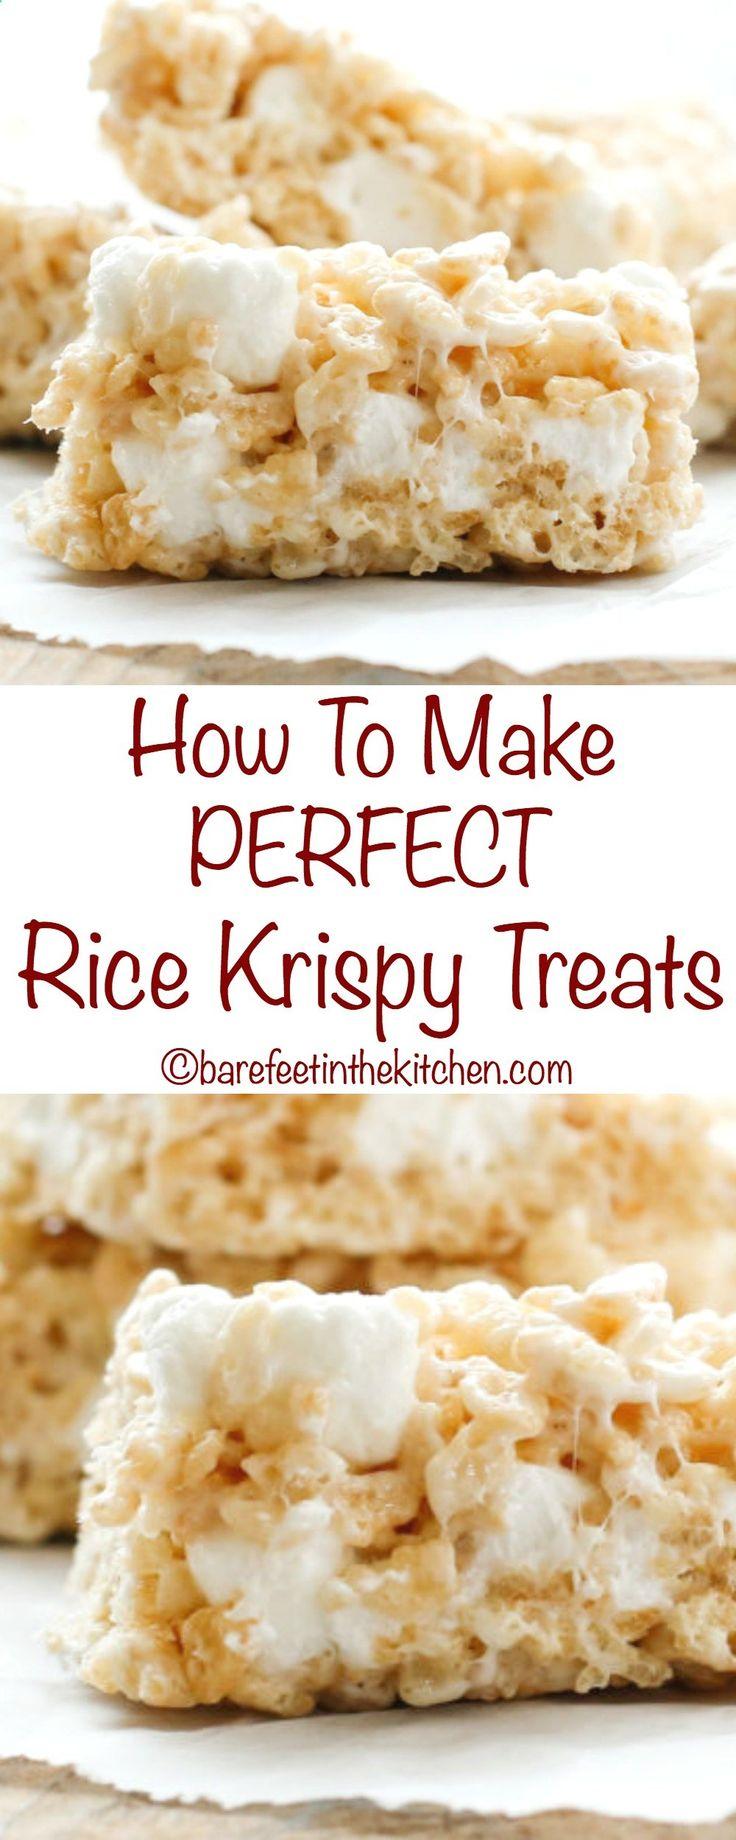 How To Make PERFECT Rice Krispy Treats - get the recipe at barefeetinthekitc...